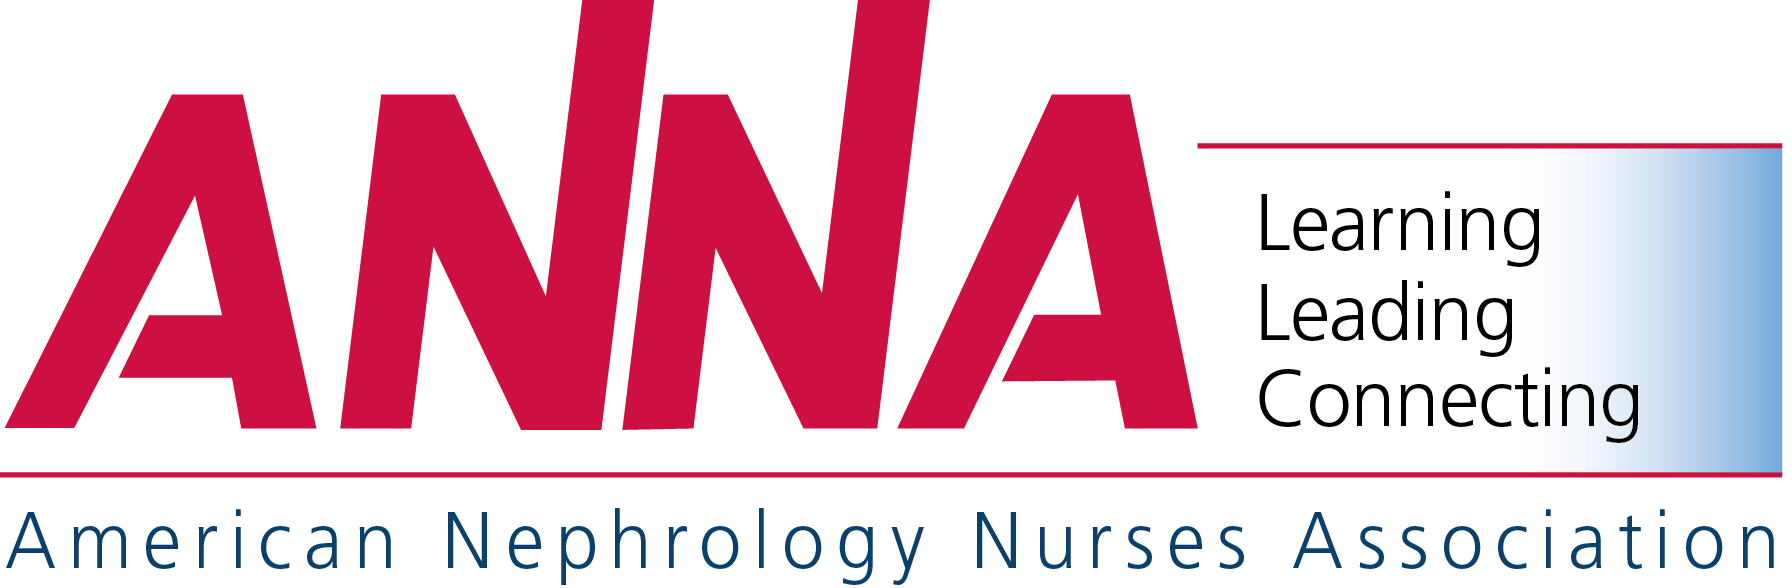 American Nephrology Nurses Association (ANNA) logo